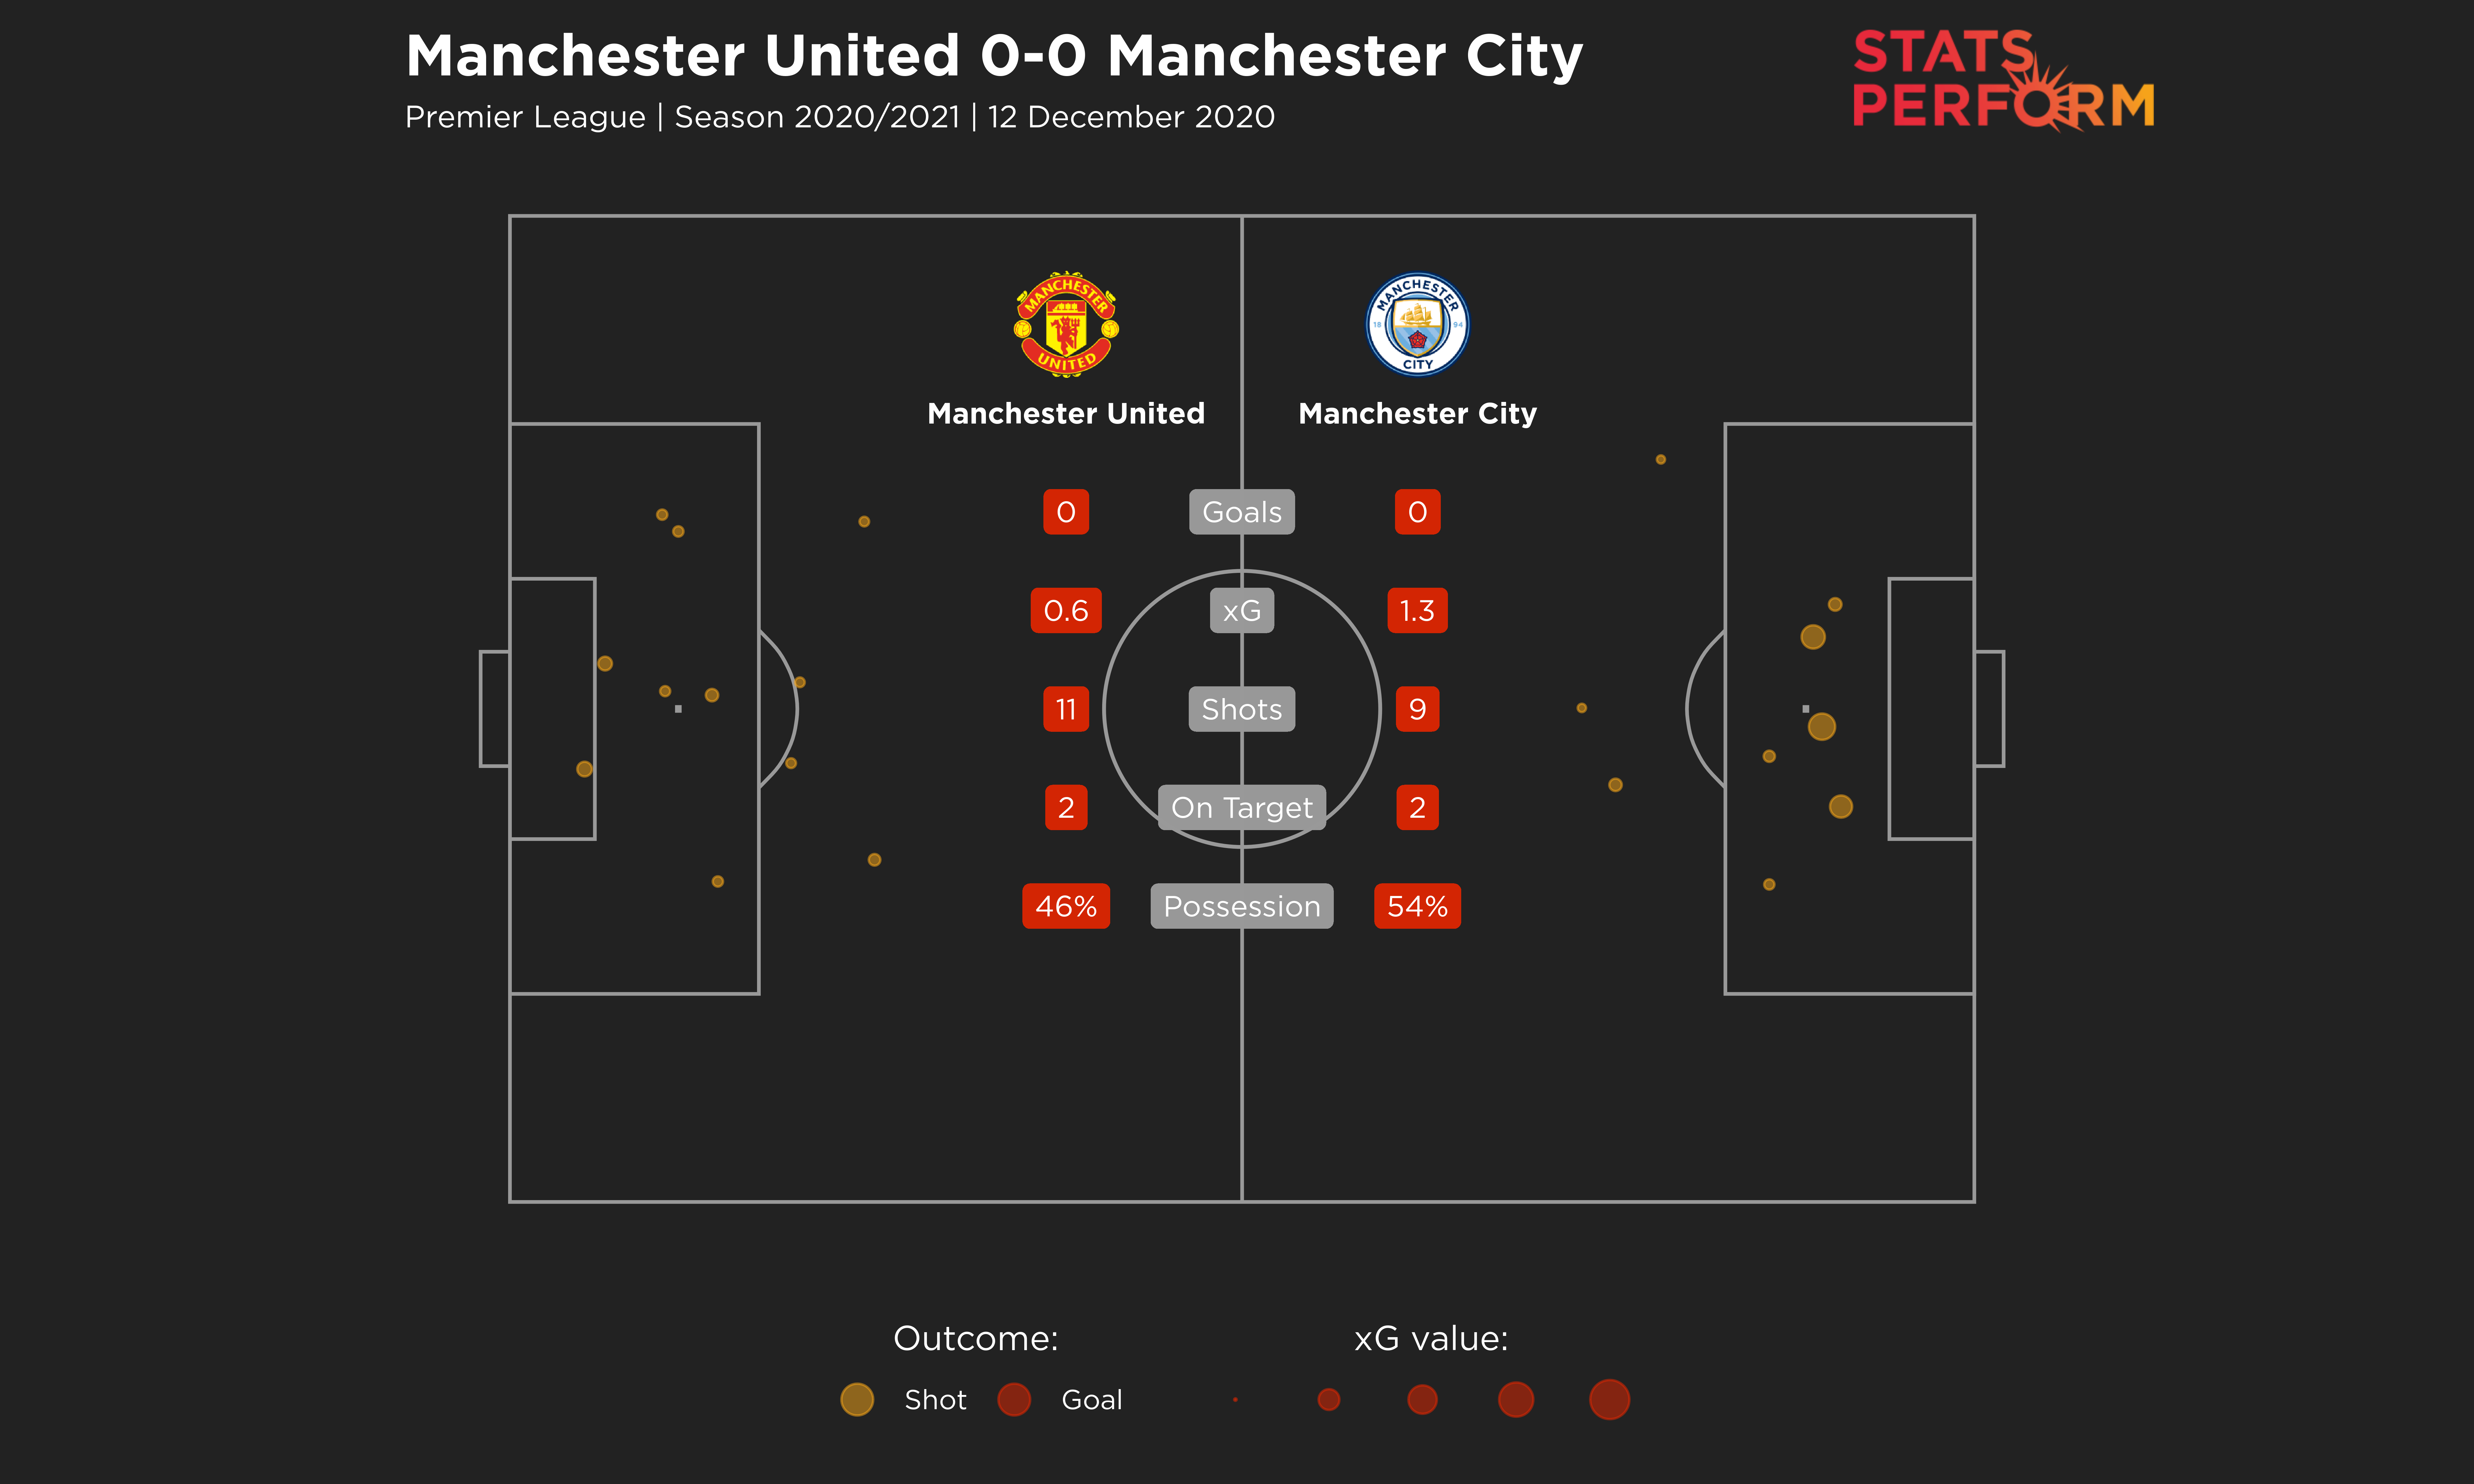 Man Utd 0-0 Man City